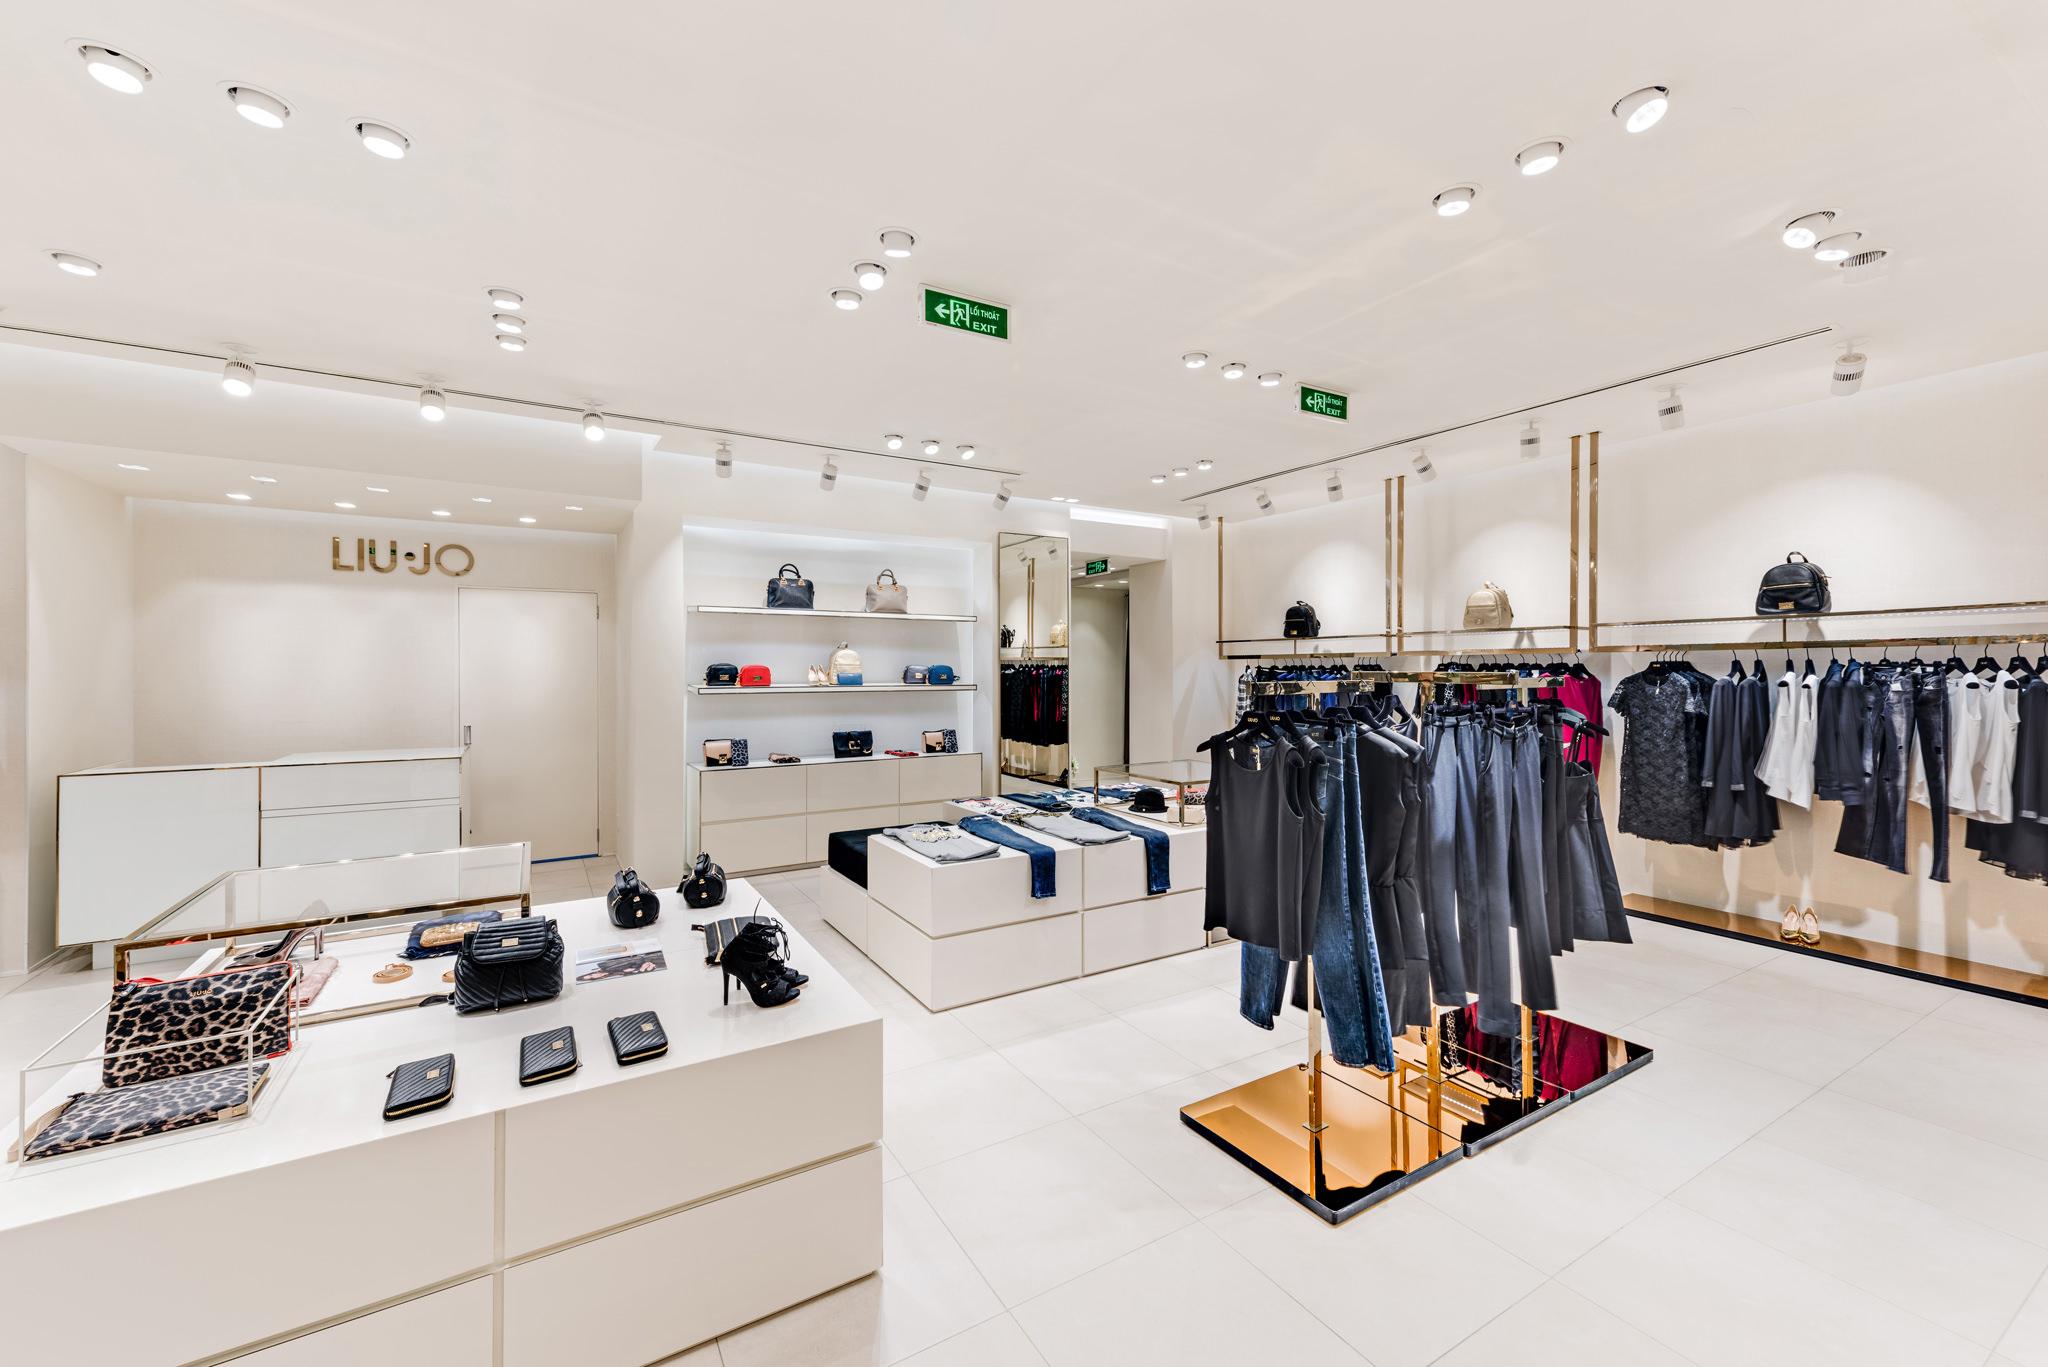 20160801 - Liu Jo - HCM - Commercial - Interior - Store - Retouch 0003.jpg